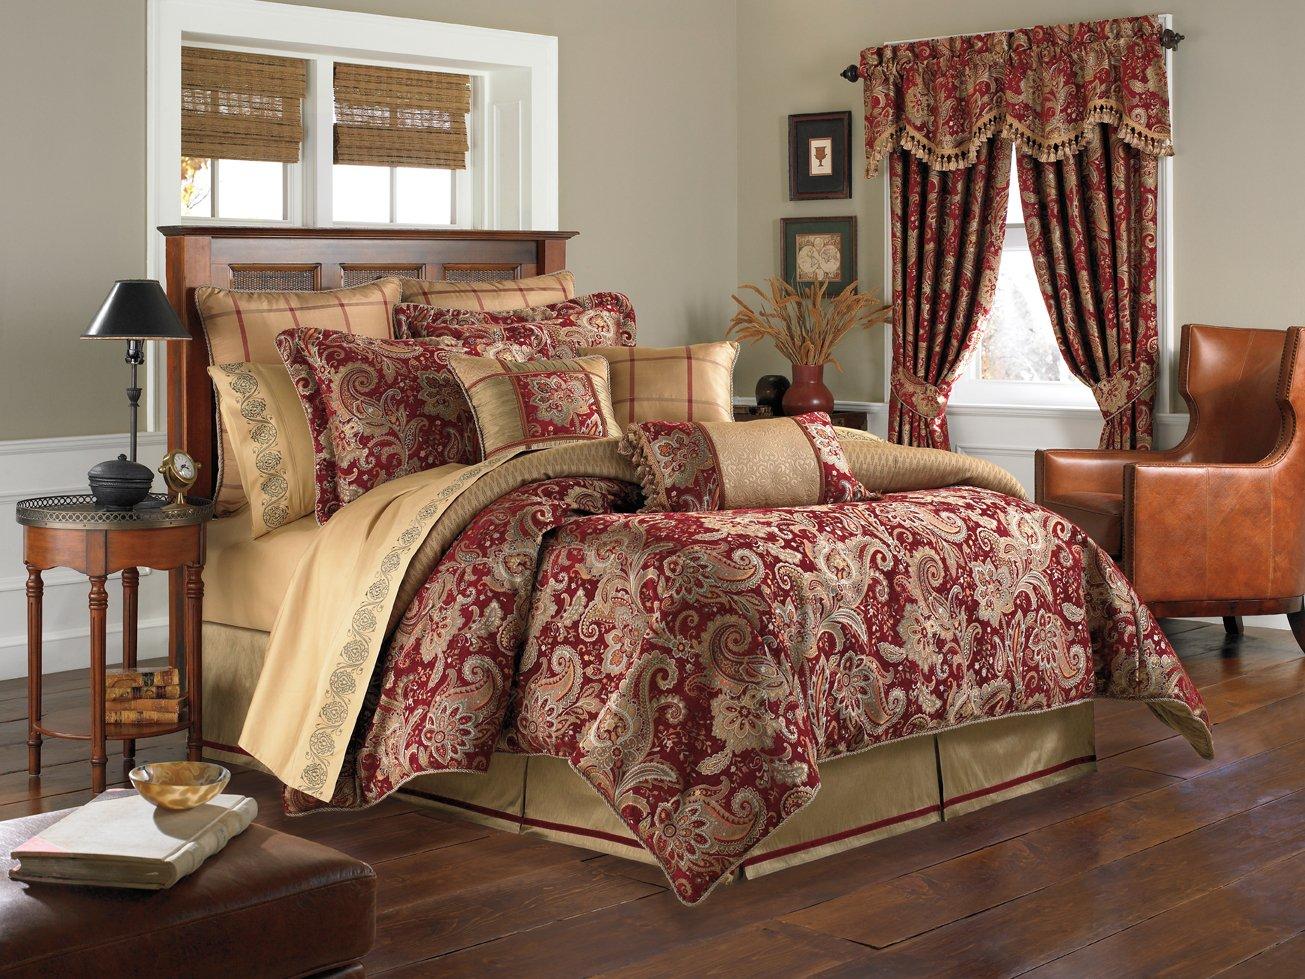 Ribbon embroidery bedspread designs - Amazon Com Croscill Home Fashions Mystique 4 Piece Comforter Set Queen Claret Home Kitchen